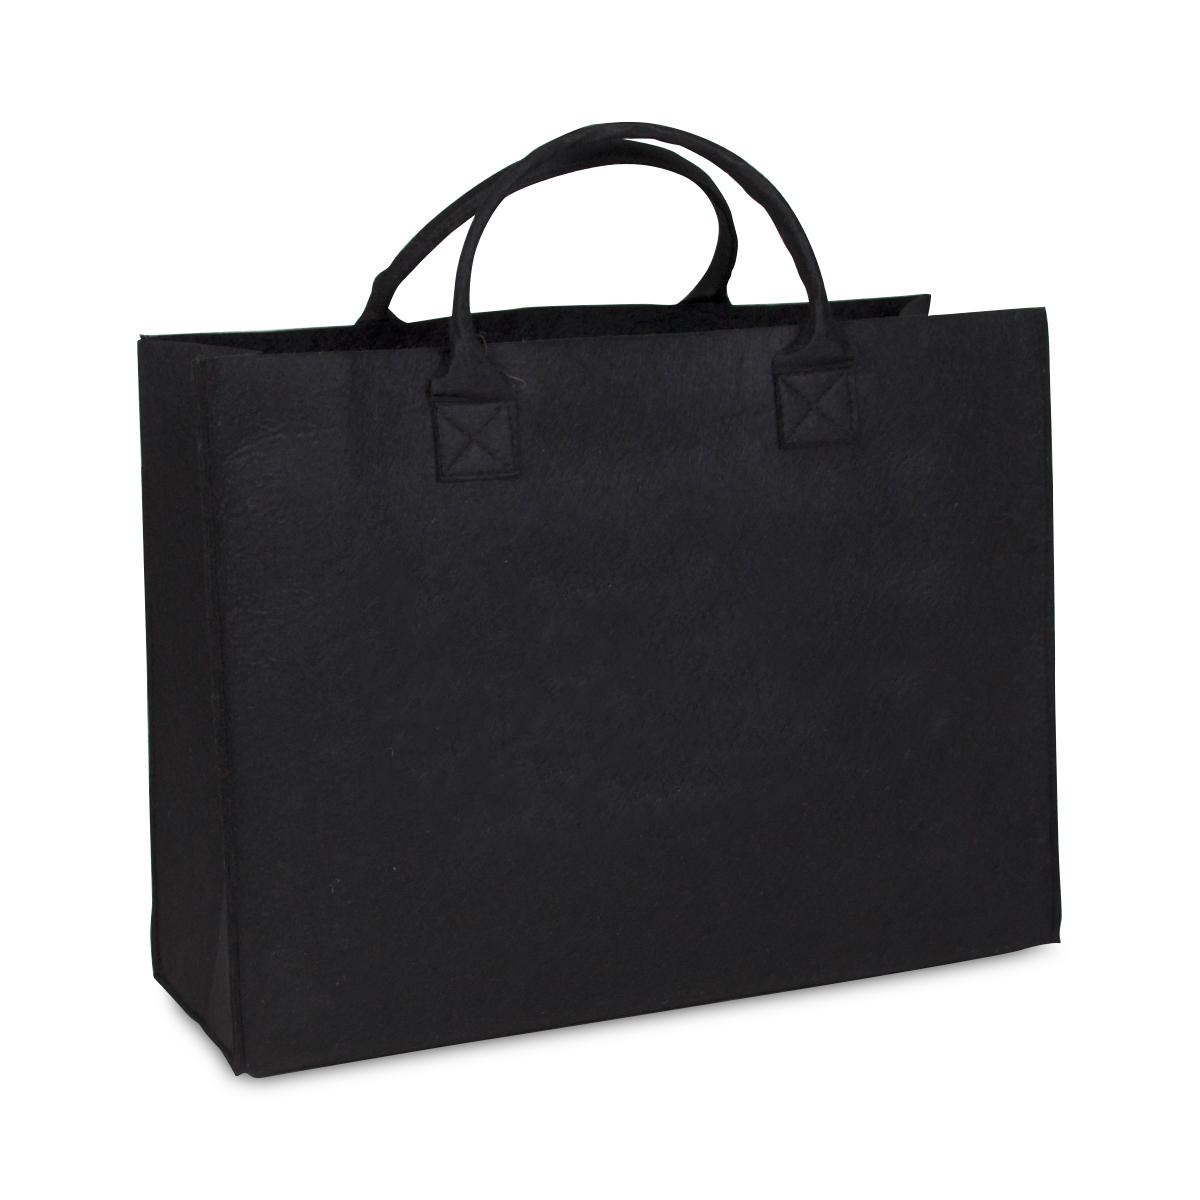 tassen-vilten-luxeshoppers-product-zwart